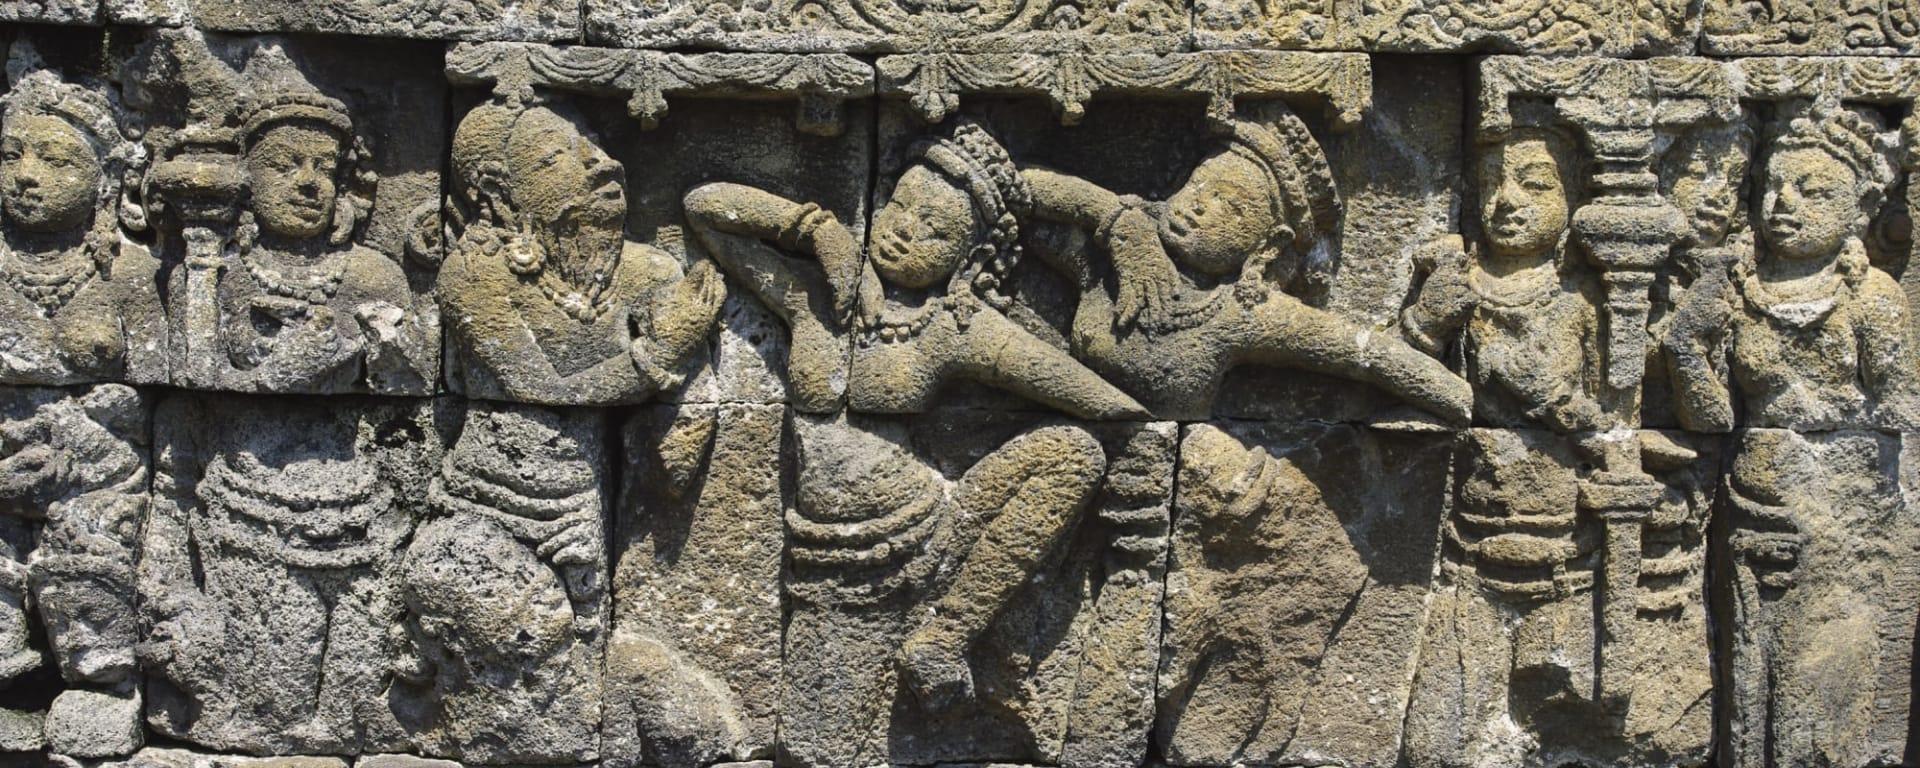 Entdeckertour Mittel-Java ab Yogyakarta und Umgebung: Indonesien Java Borobudur Details